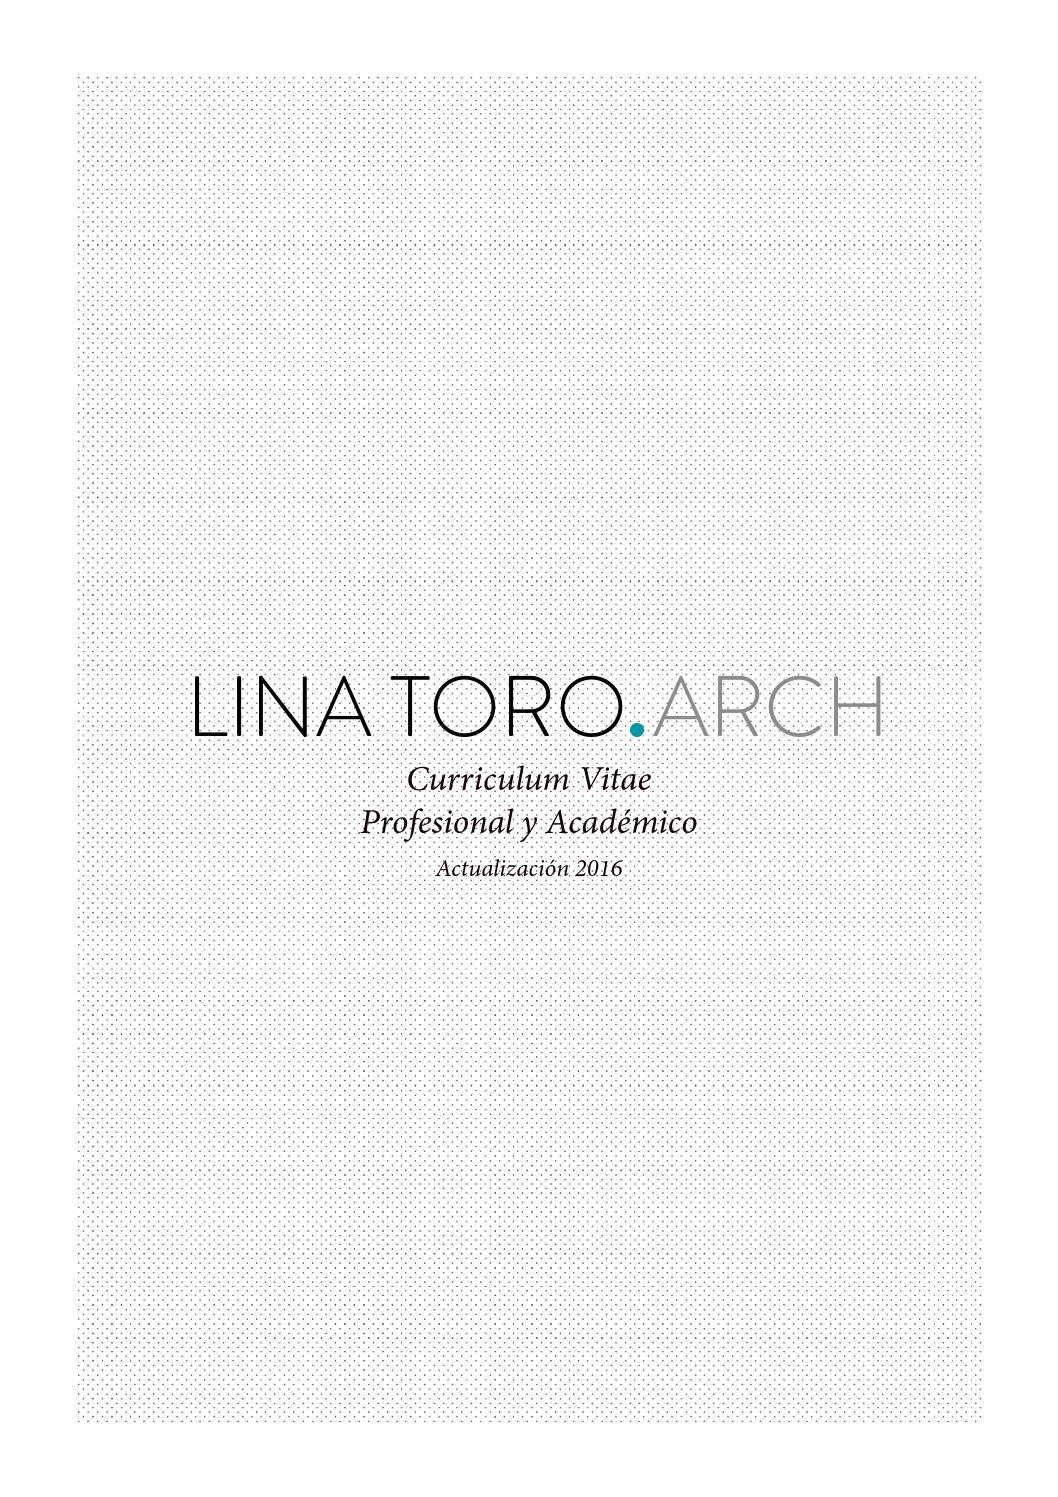 Linatoro.arch by linatoro.arch - issuu